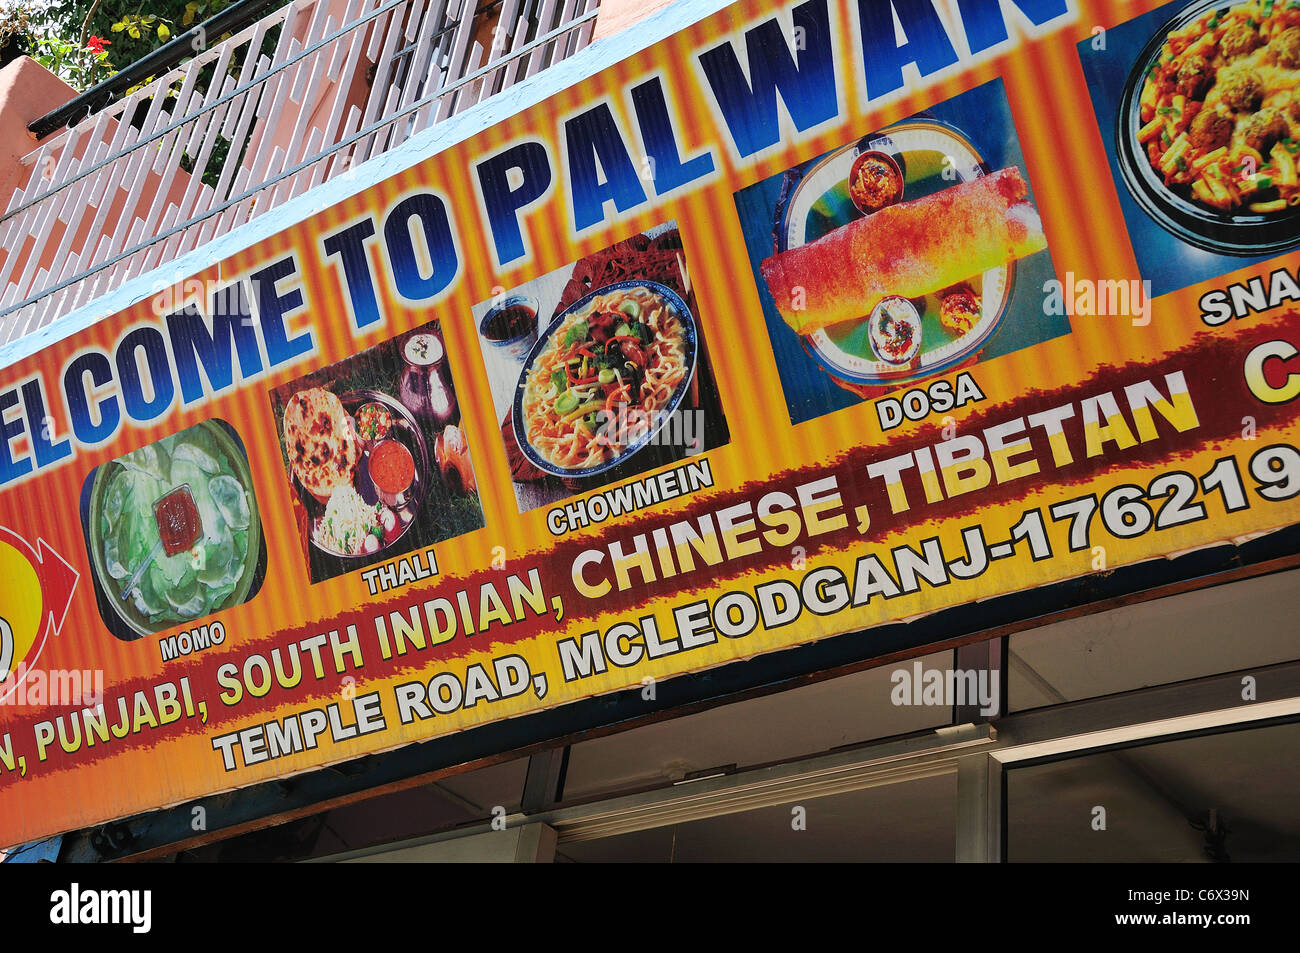 Restaurant sign board at McLeod Ganj. - Stock Image